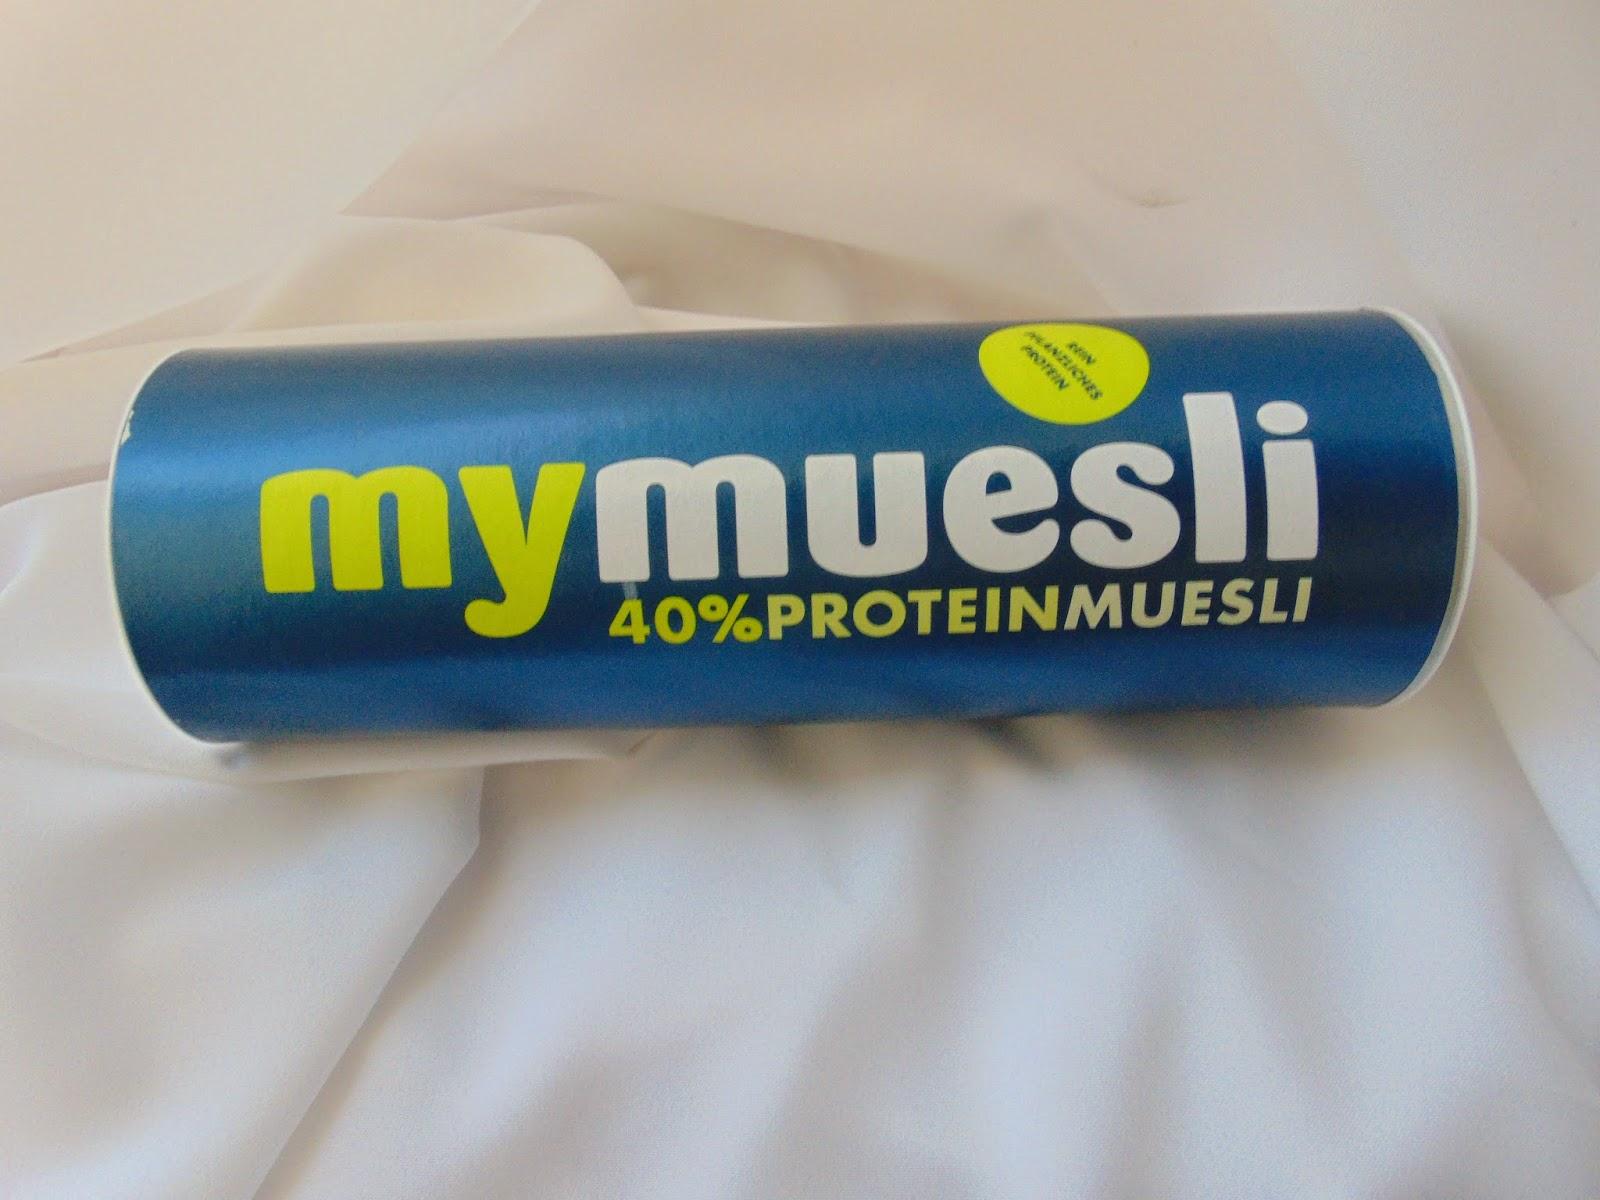 My Muesli - Glamour Shopping Week  - Protein Müsli - www.annitschkasblog.de